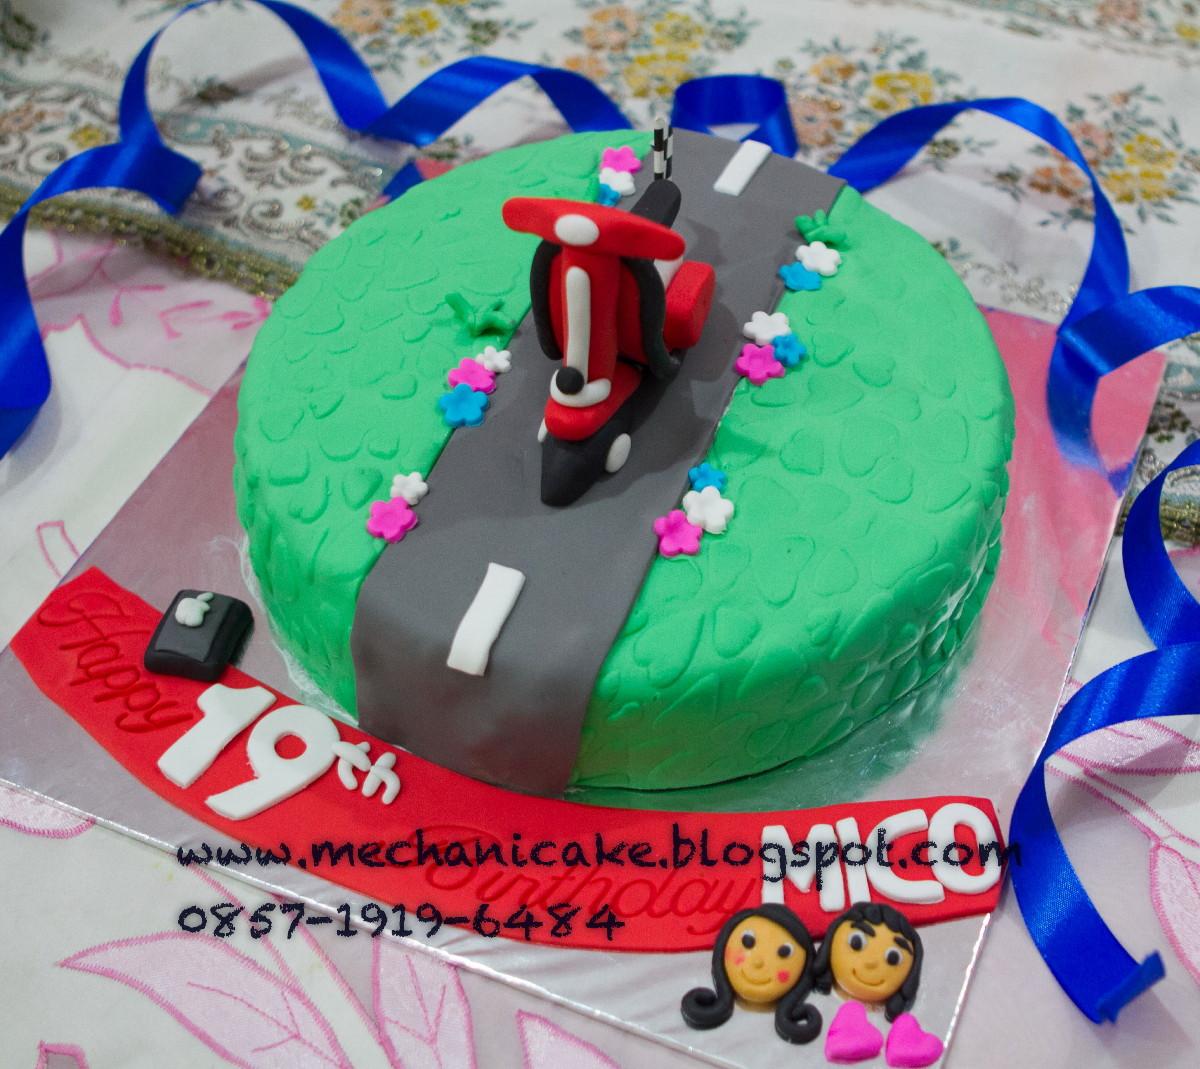 MechaniCake Micos Vespa Birthday Cake from Ines